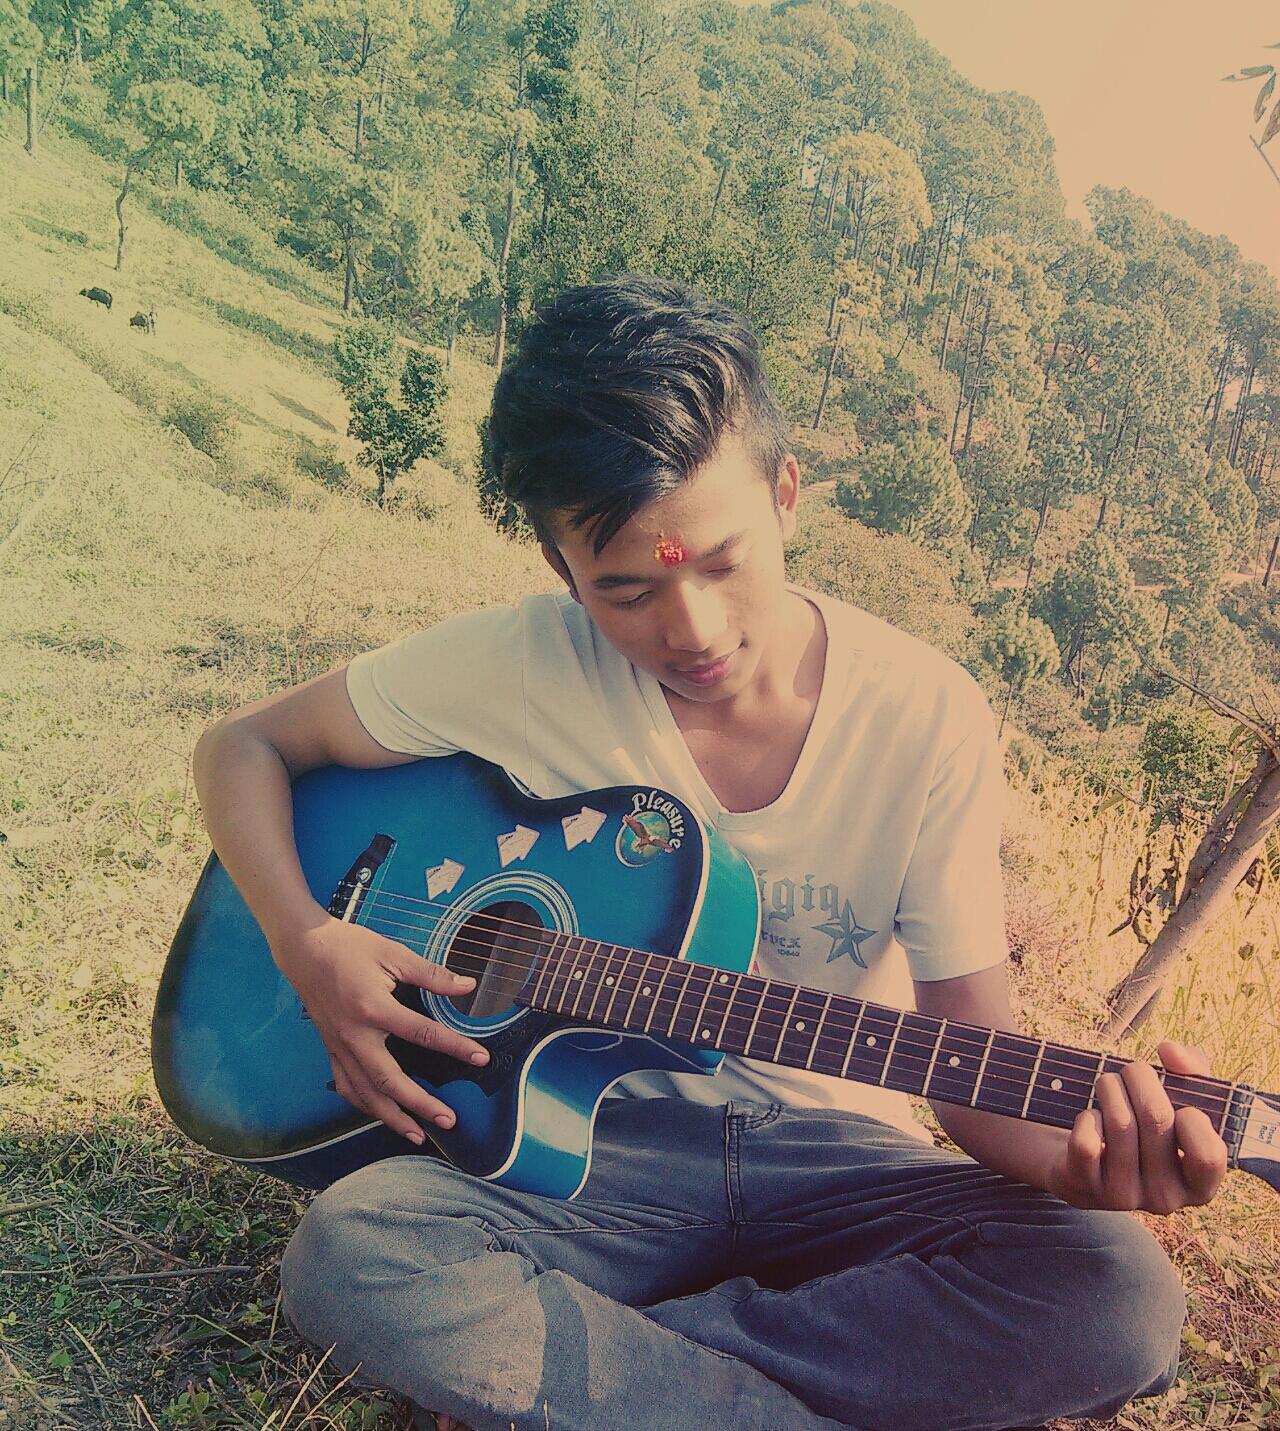 Songs Lyrics Wth Guitar Chordsenglishhindinepali About Us